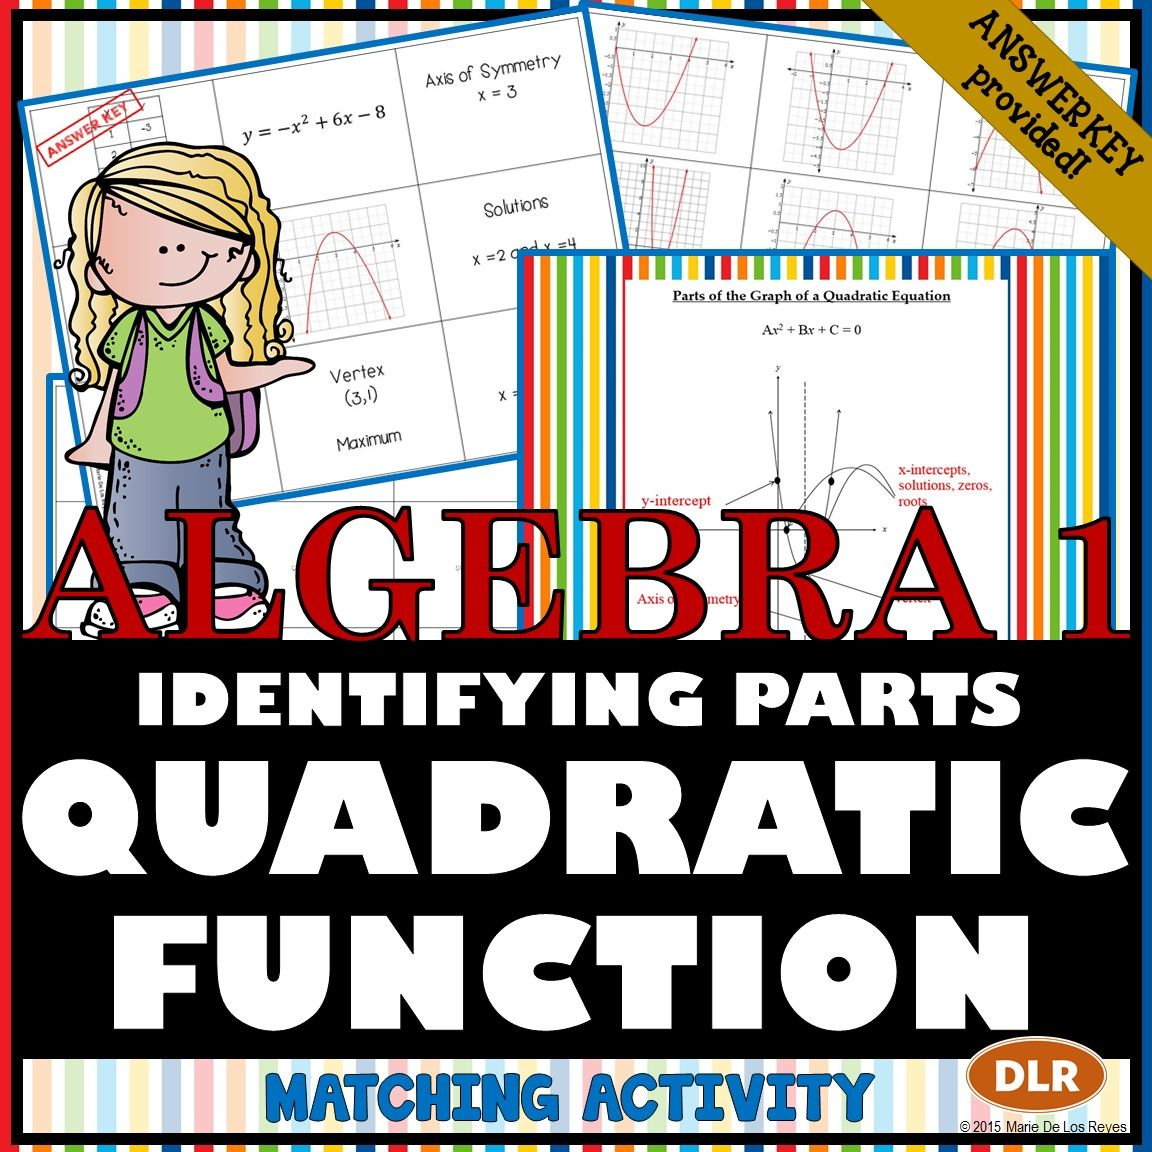 Quadratic Functions Quadratics Quadratic Equation Matching Activity [ 1152 x 1152 Pixel ]